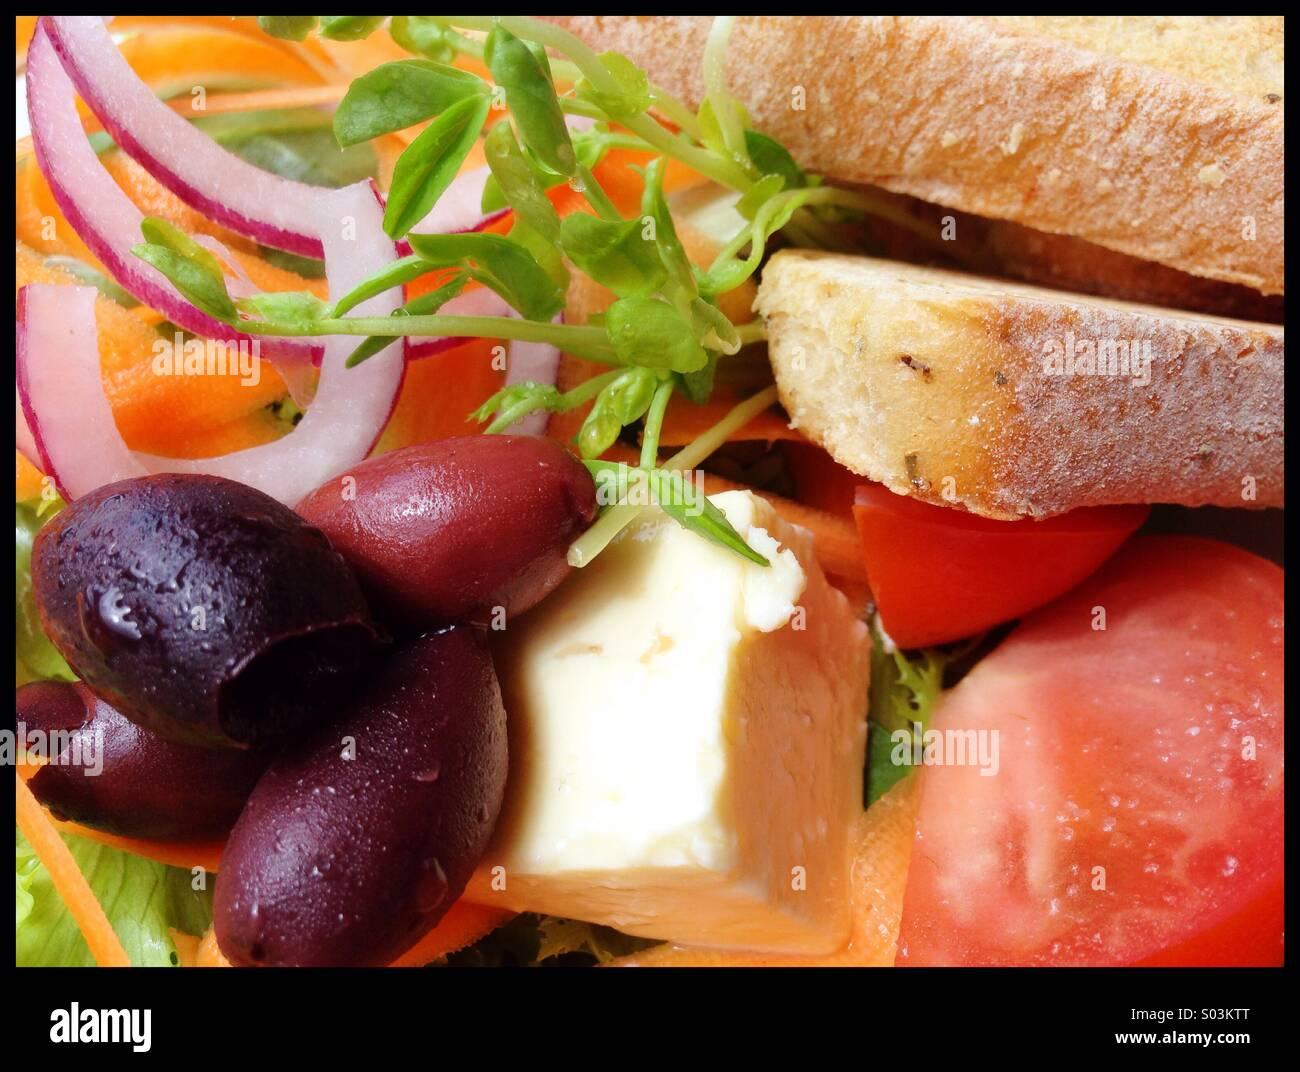 Salat und Brot Stockbild